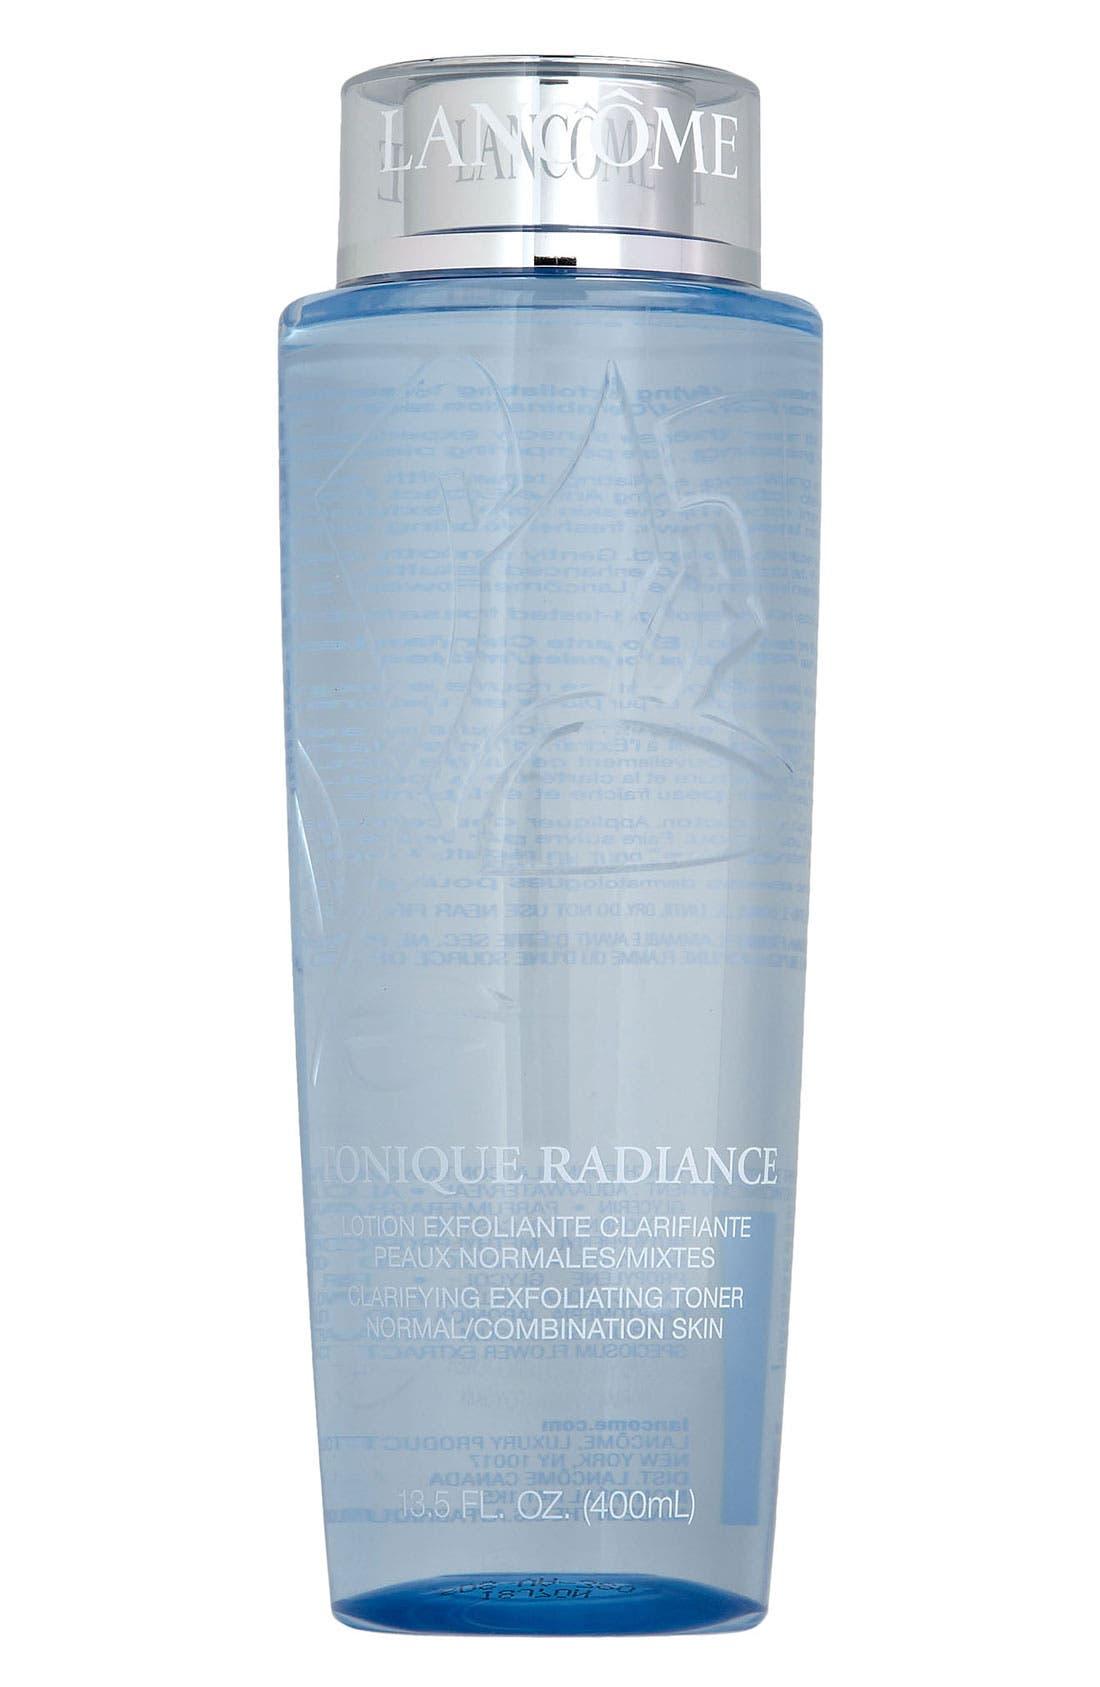 Tonique Radiance Clarifying Exfoliating Toner,                             Main thumbnail 1, color,                             NO COLOR